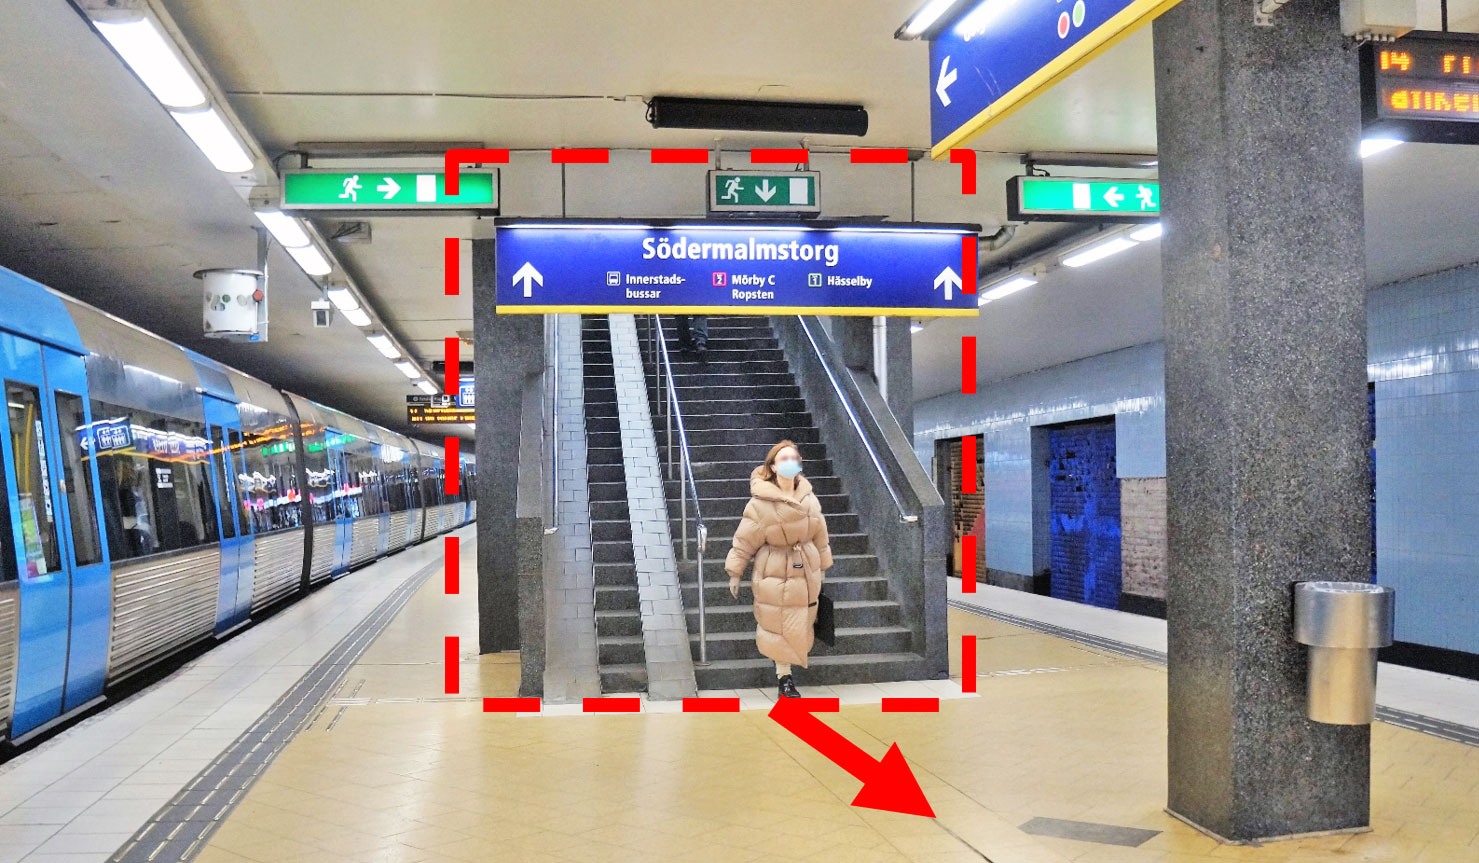 Tunnelbanenedgång